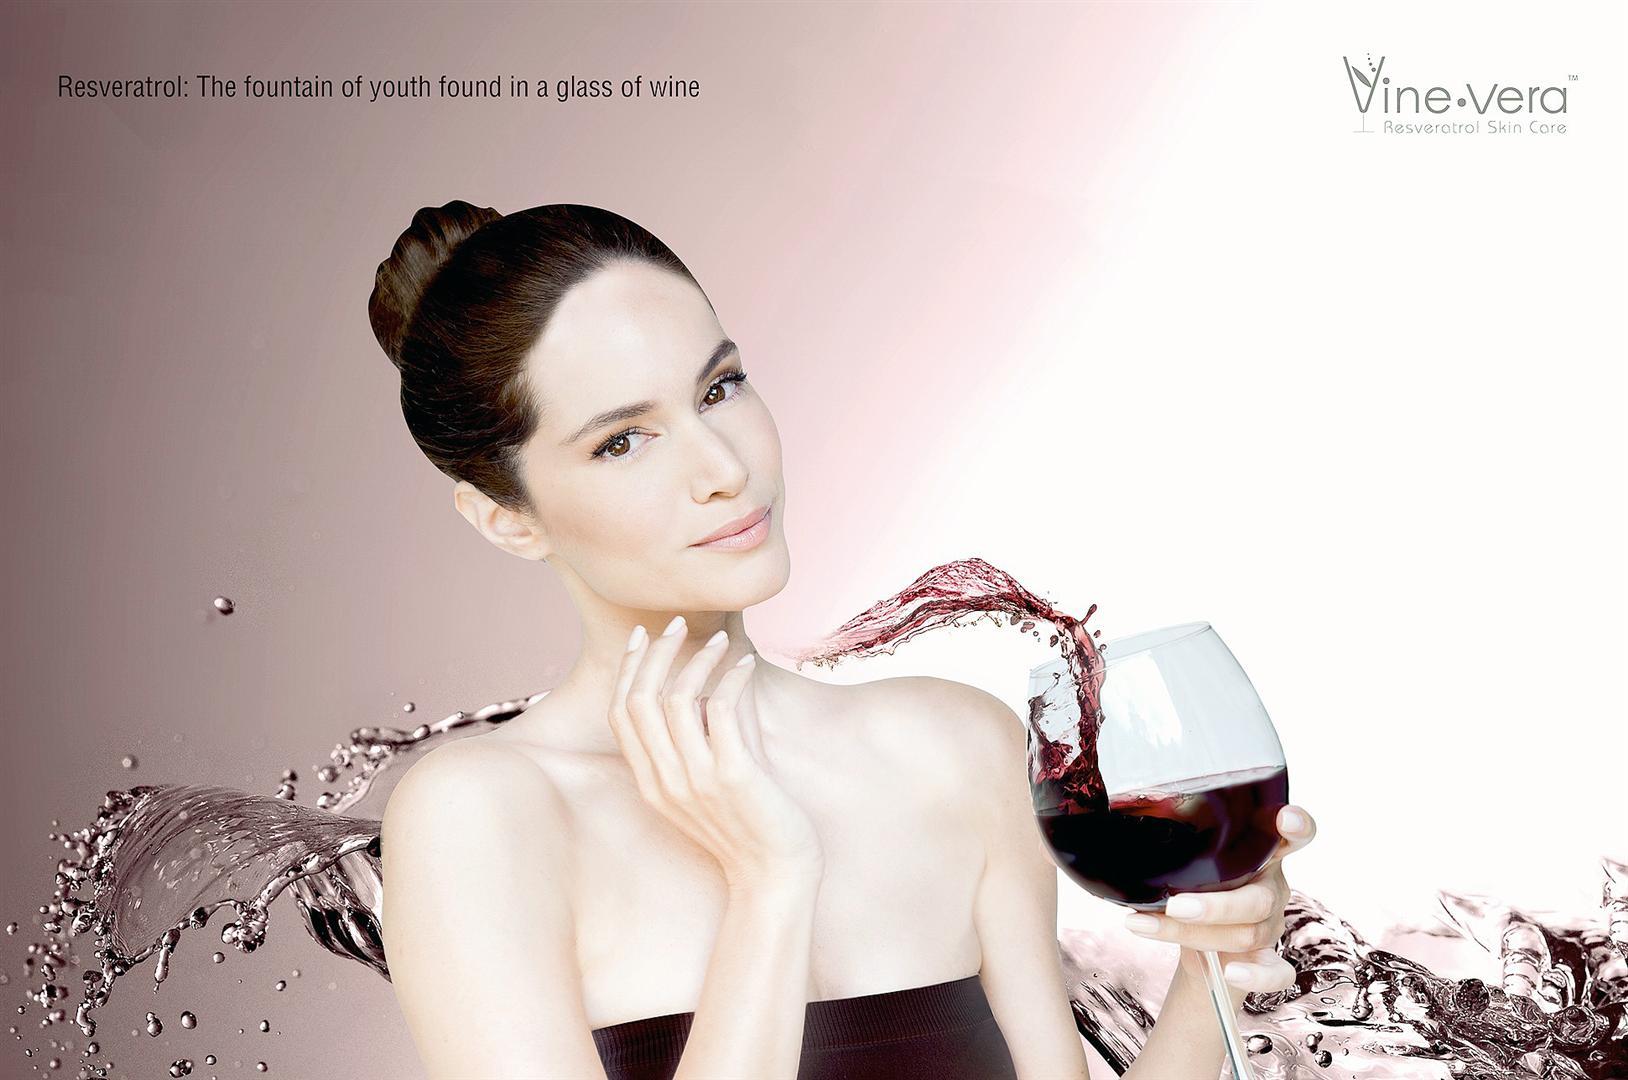 יין לעור הפנים (צילום : איאן פישר)